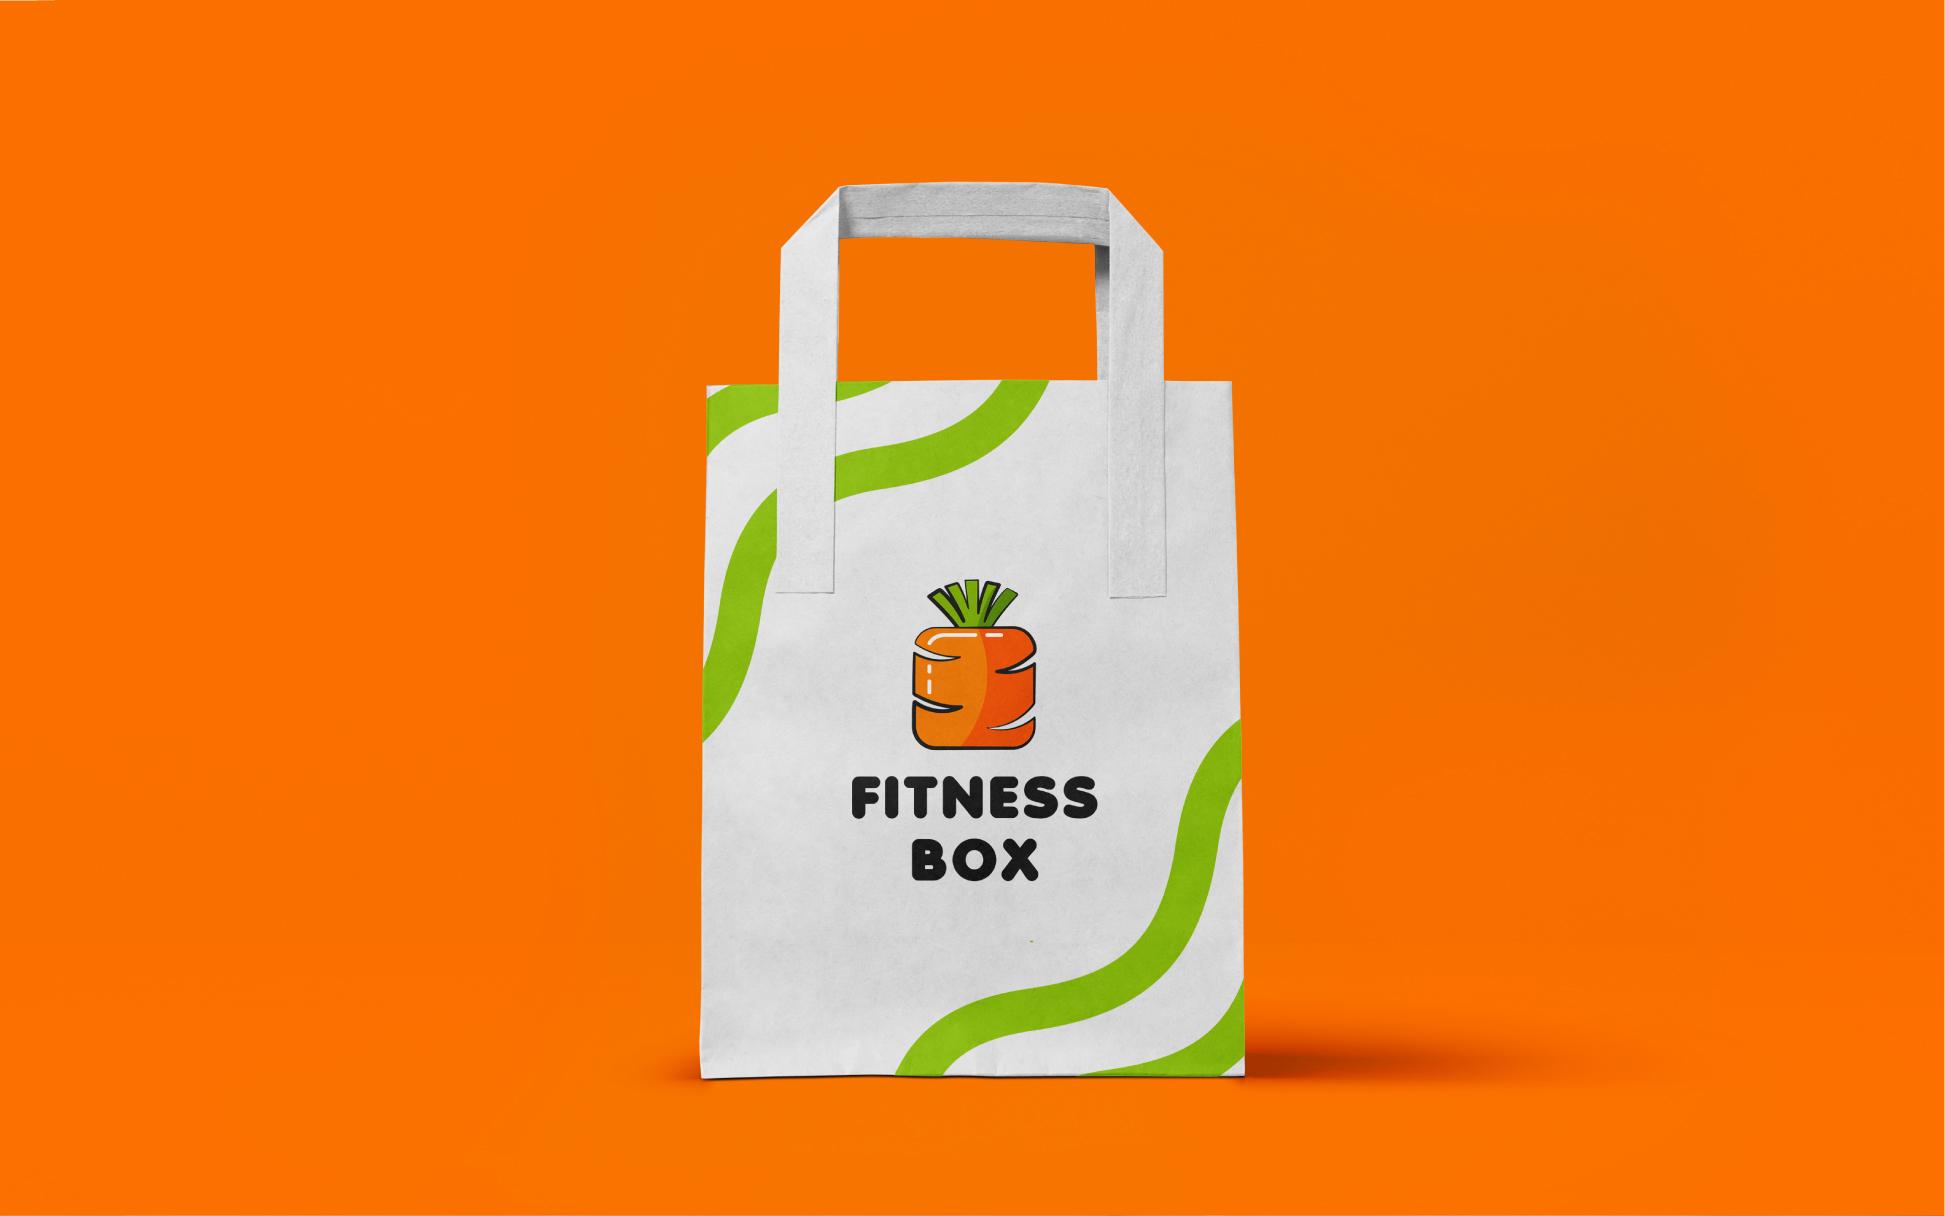 fitness box 7